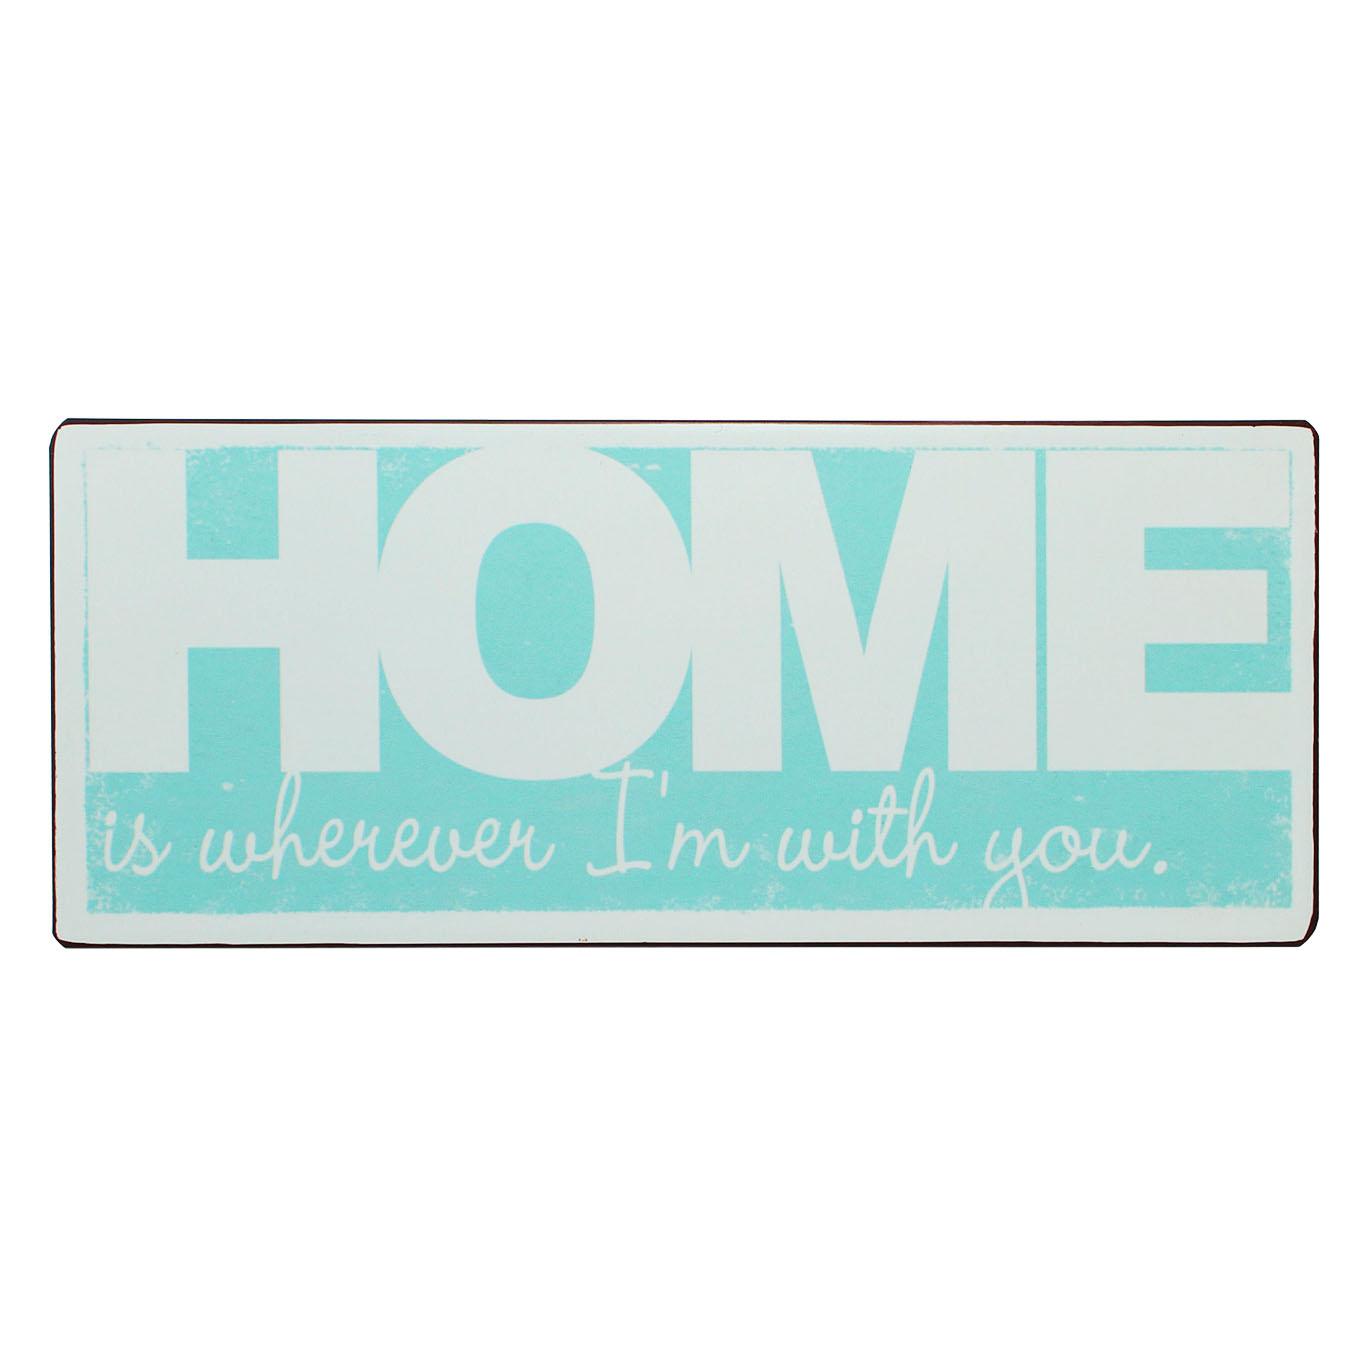 em4371-Home-is-wherever-I-am-with-yout-spreukenbord-tekstbord-uitspraken-gezegde-spreuken-rustiek-tekst-bord-cadeau-kado-online-metaal v